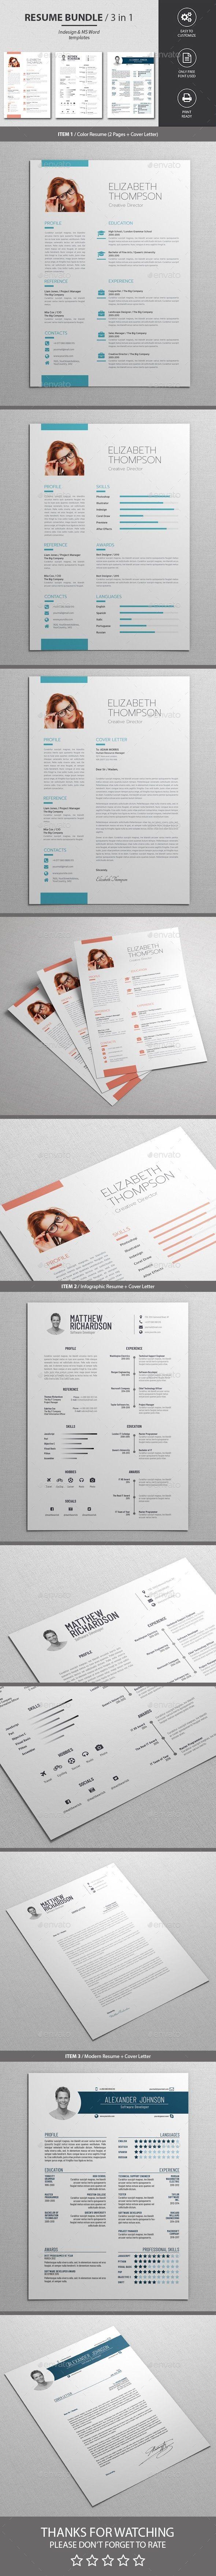 The 25+ best Resume fonts ideas on Pinterest   Resume ideas ...